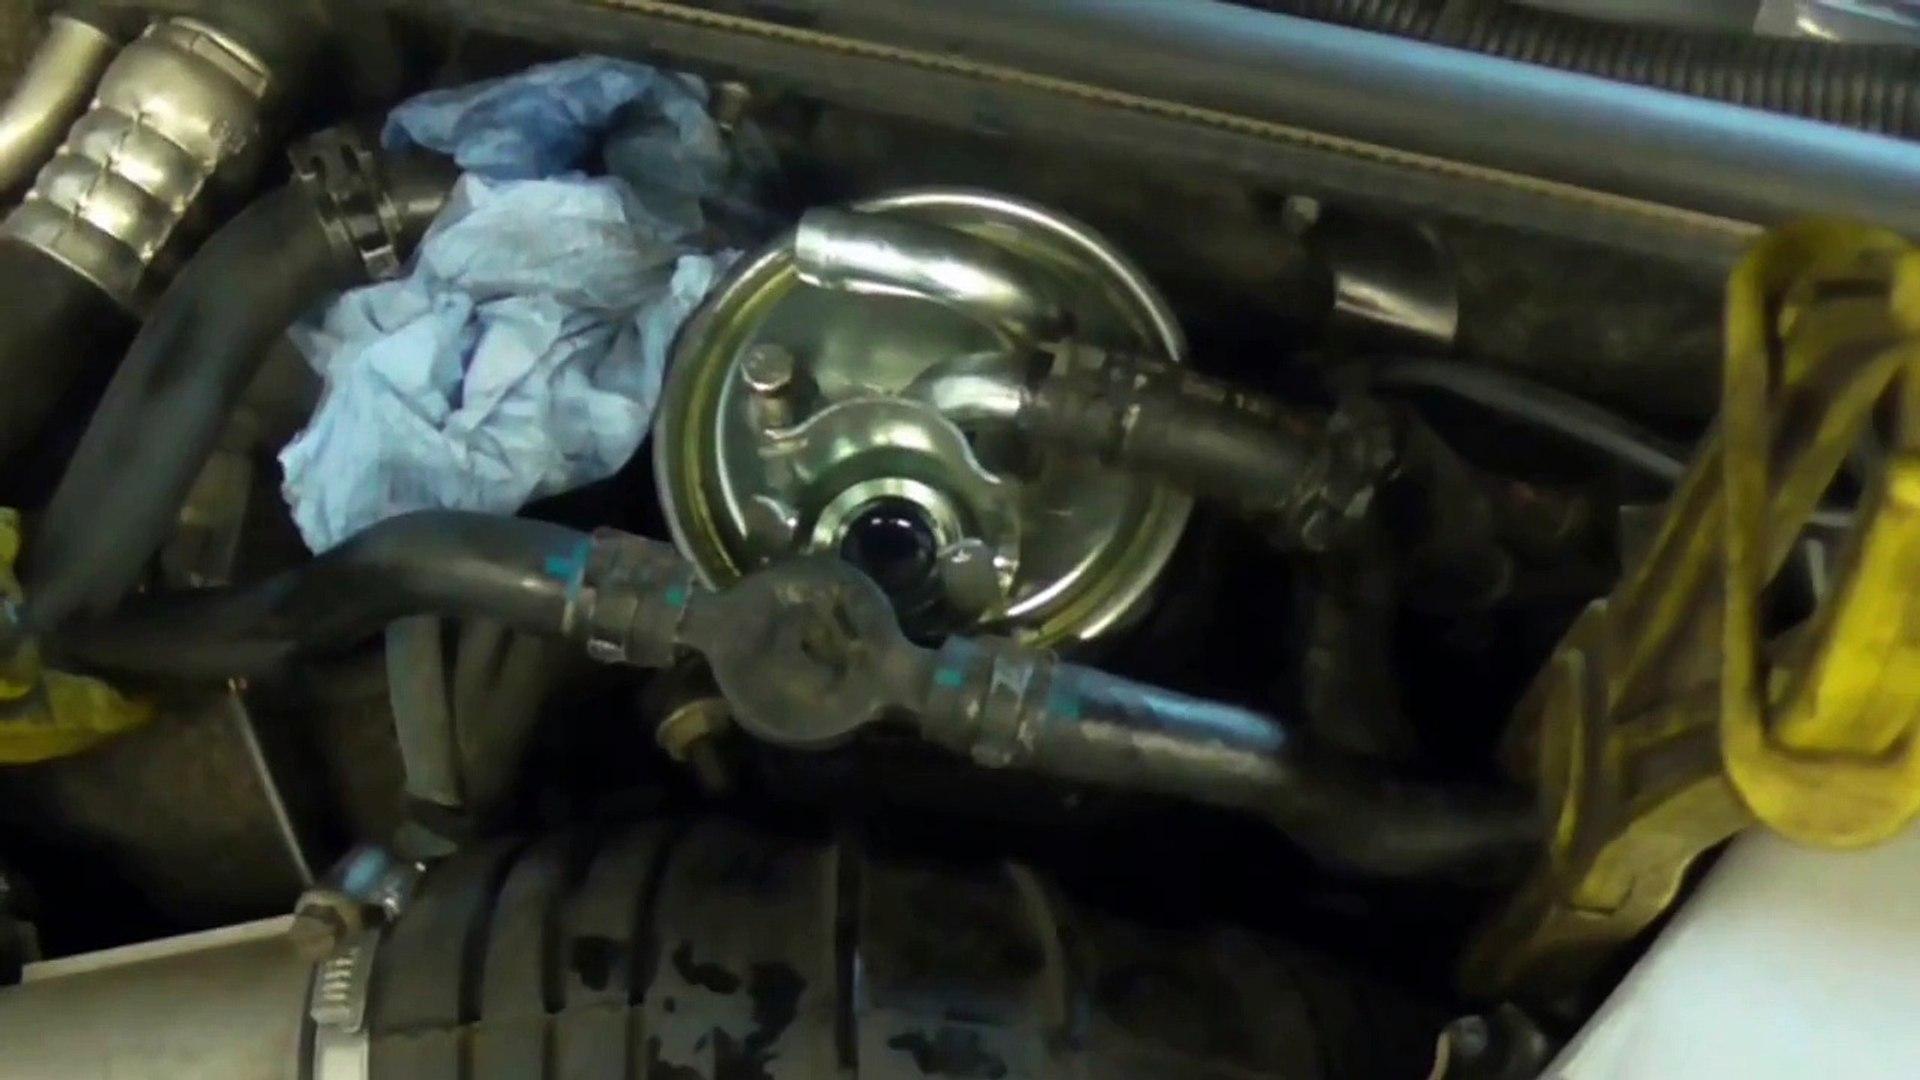 Audi A4 Kraftstofffilter Wechseln | Audi A4 Fuel Filter to change